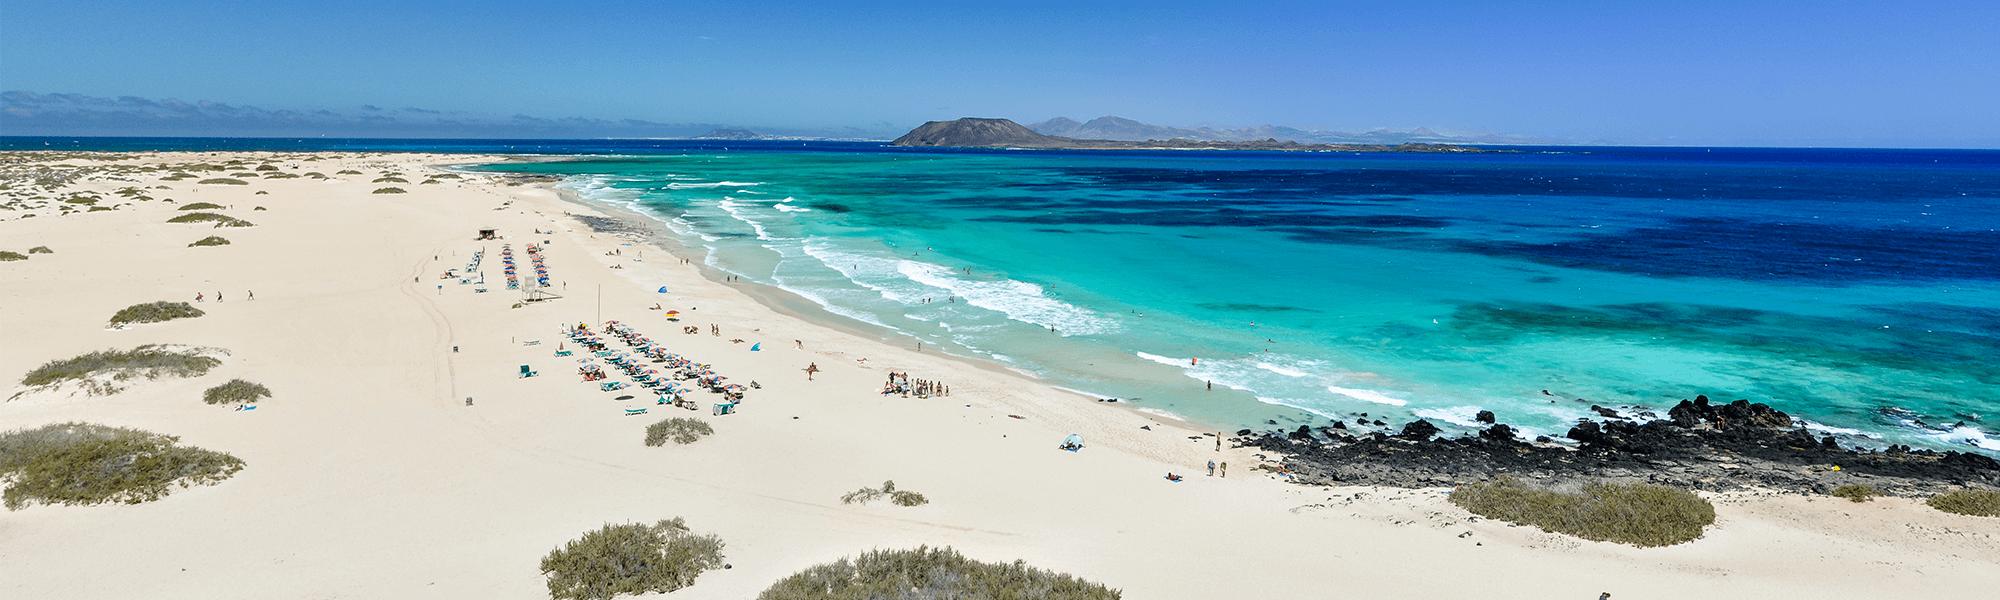 Fuerteventura-Corralejo-Beach